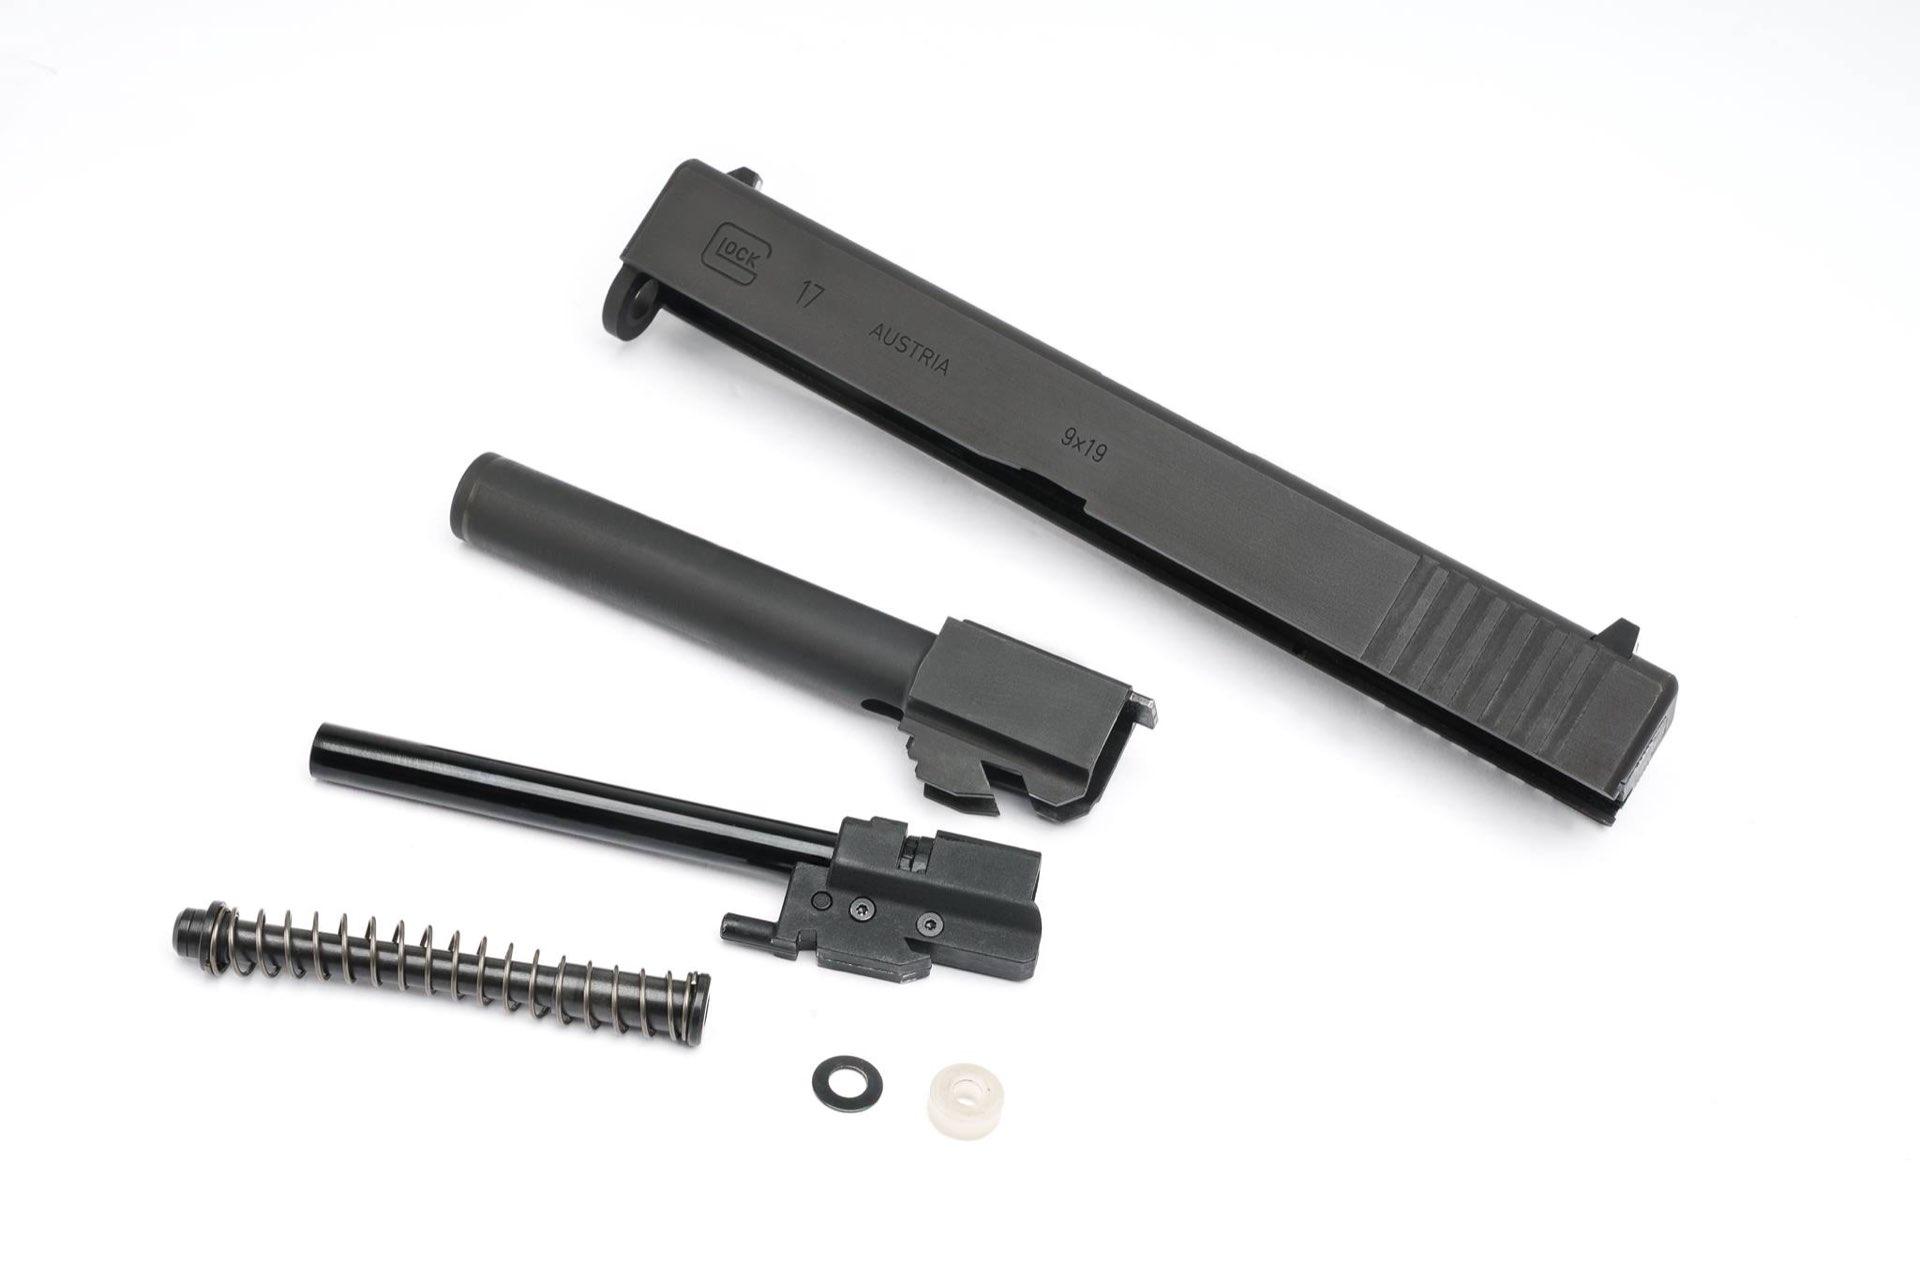 GHK Umarex Glock 17 Gen 3 GBB (zamek i lufa)